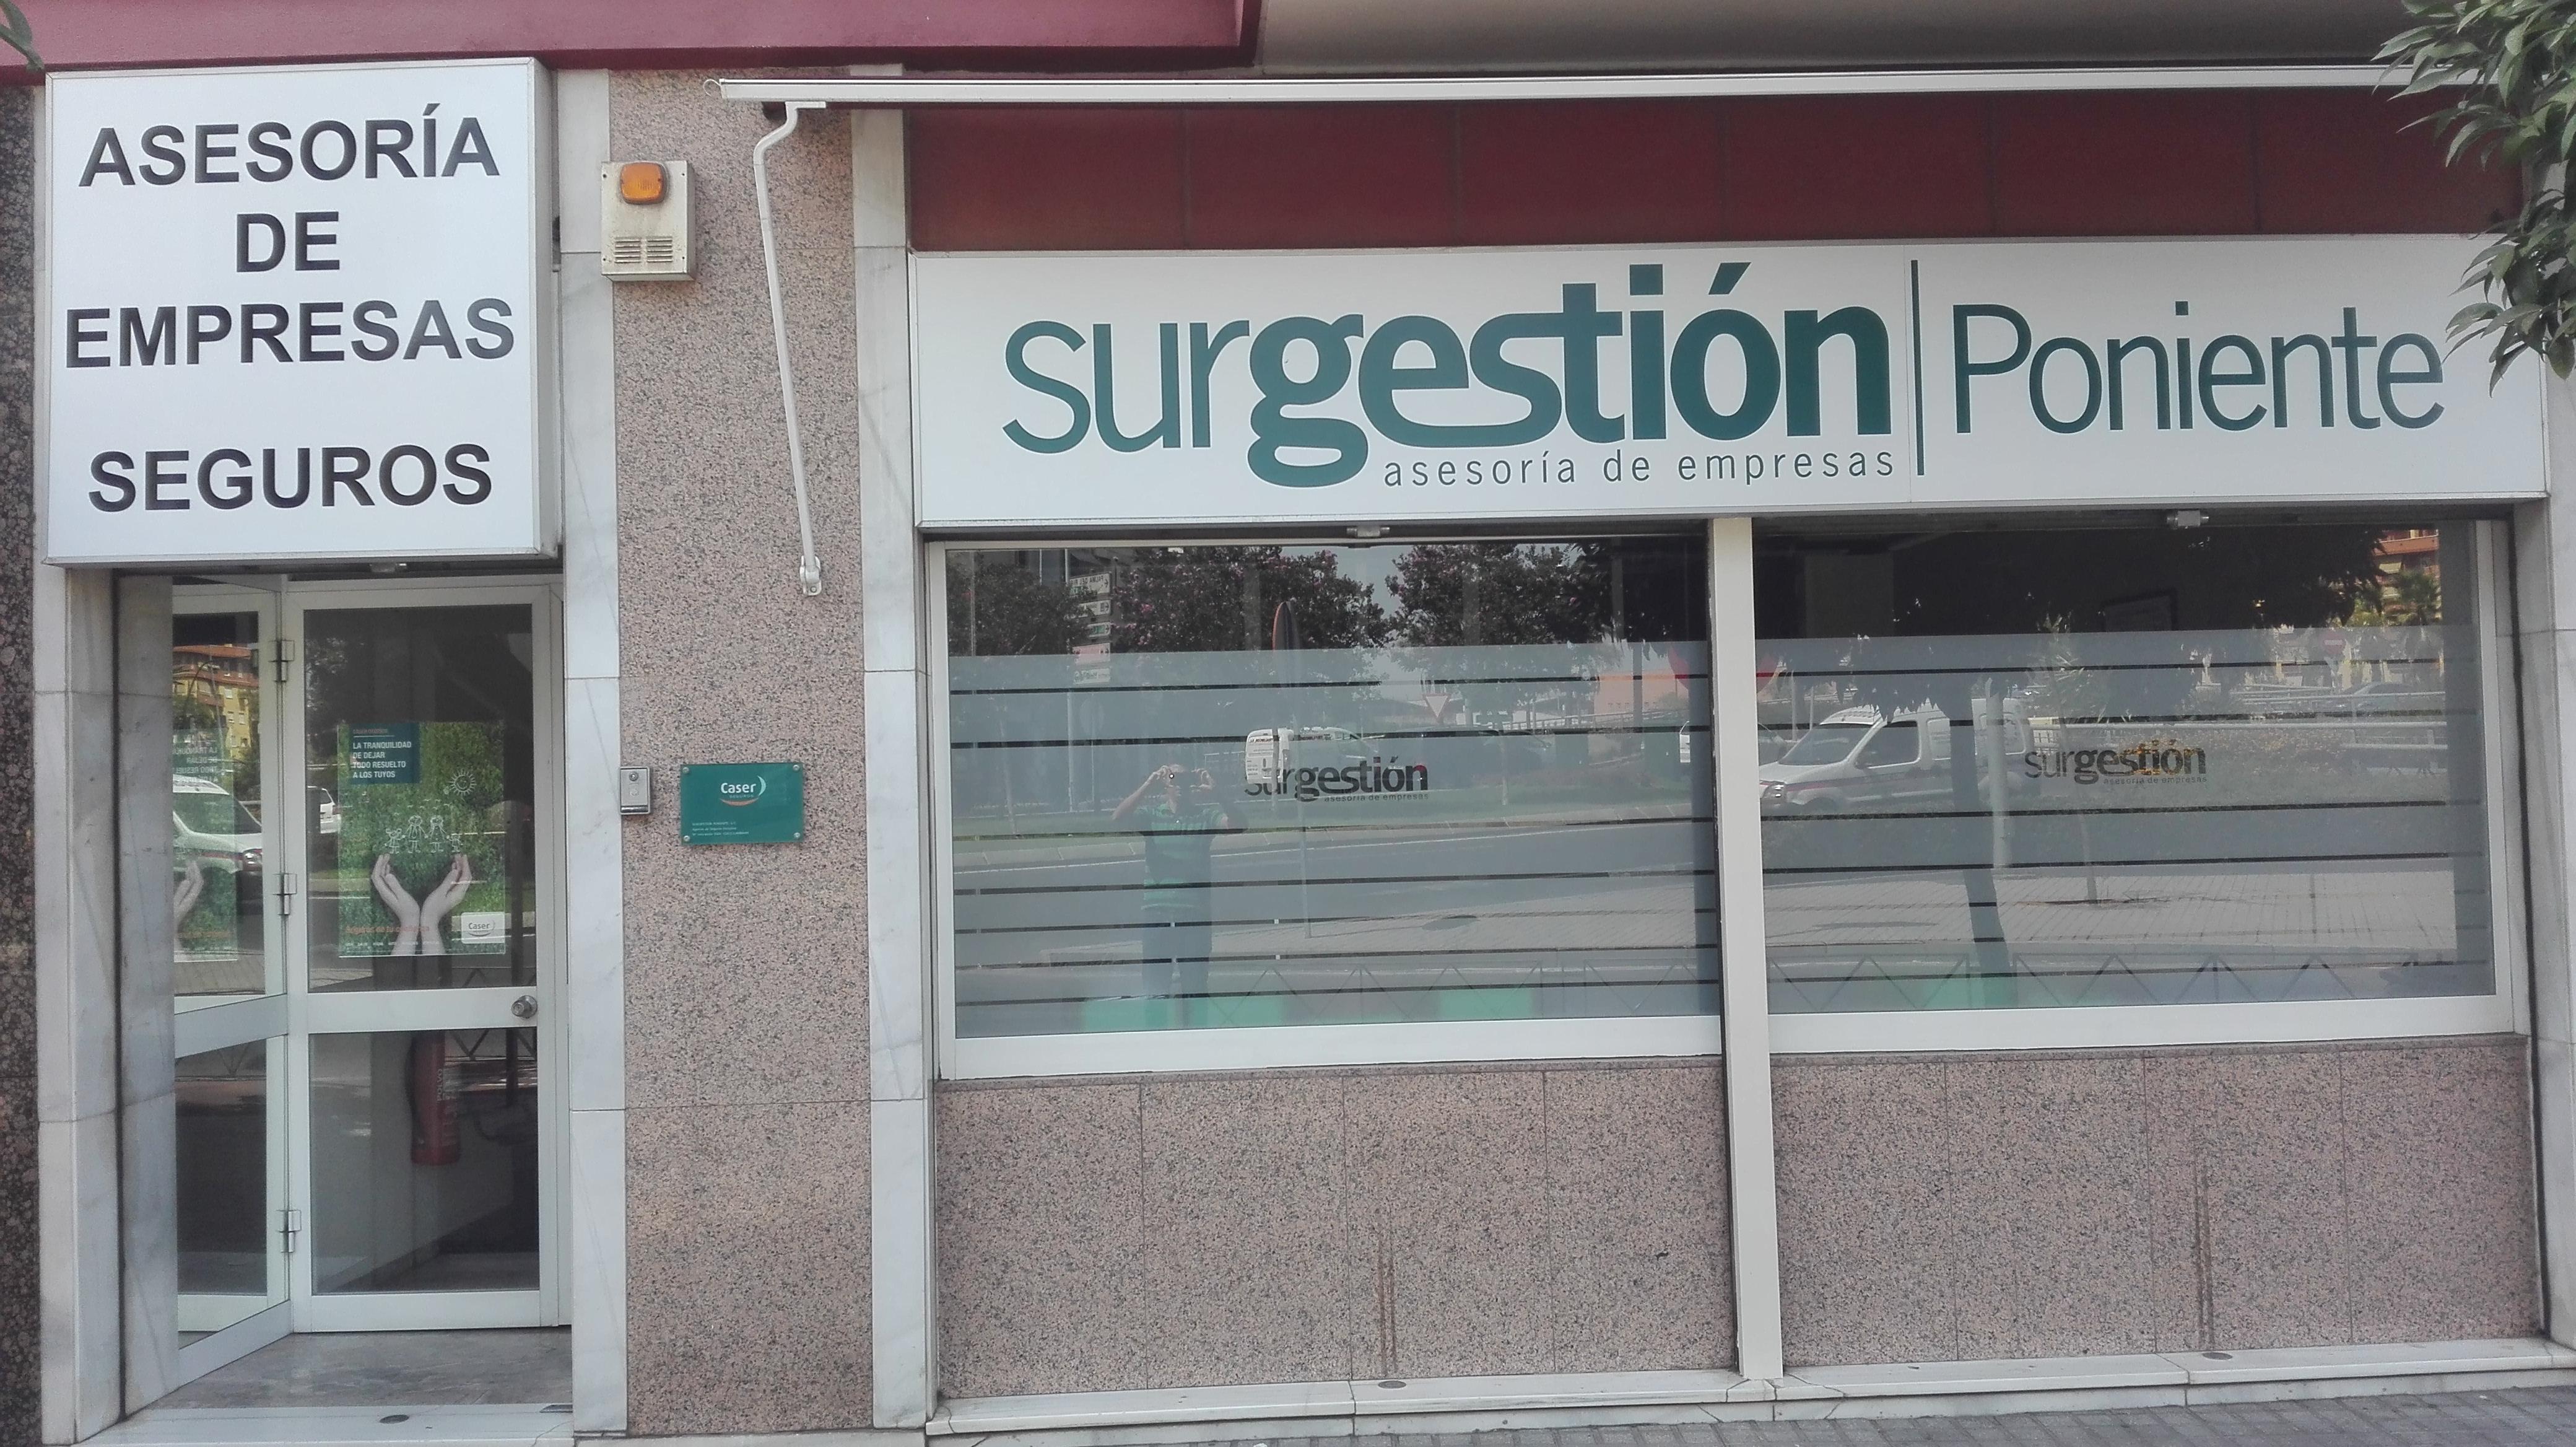 Surgestion POniente